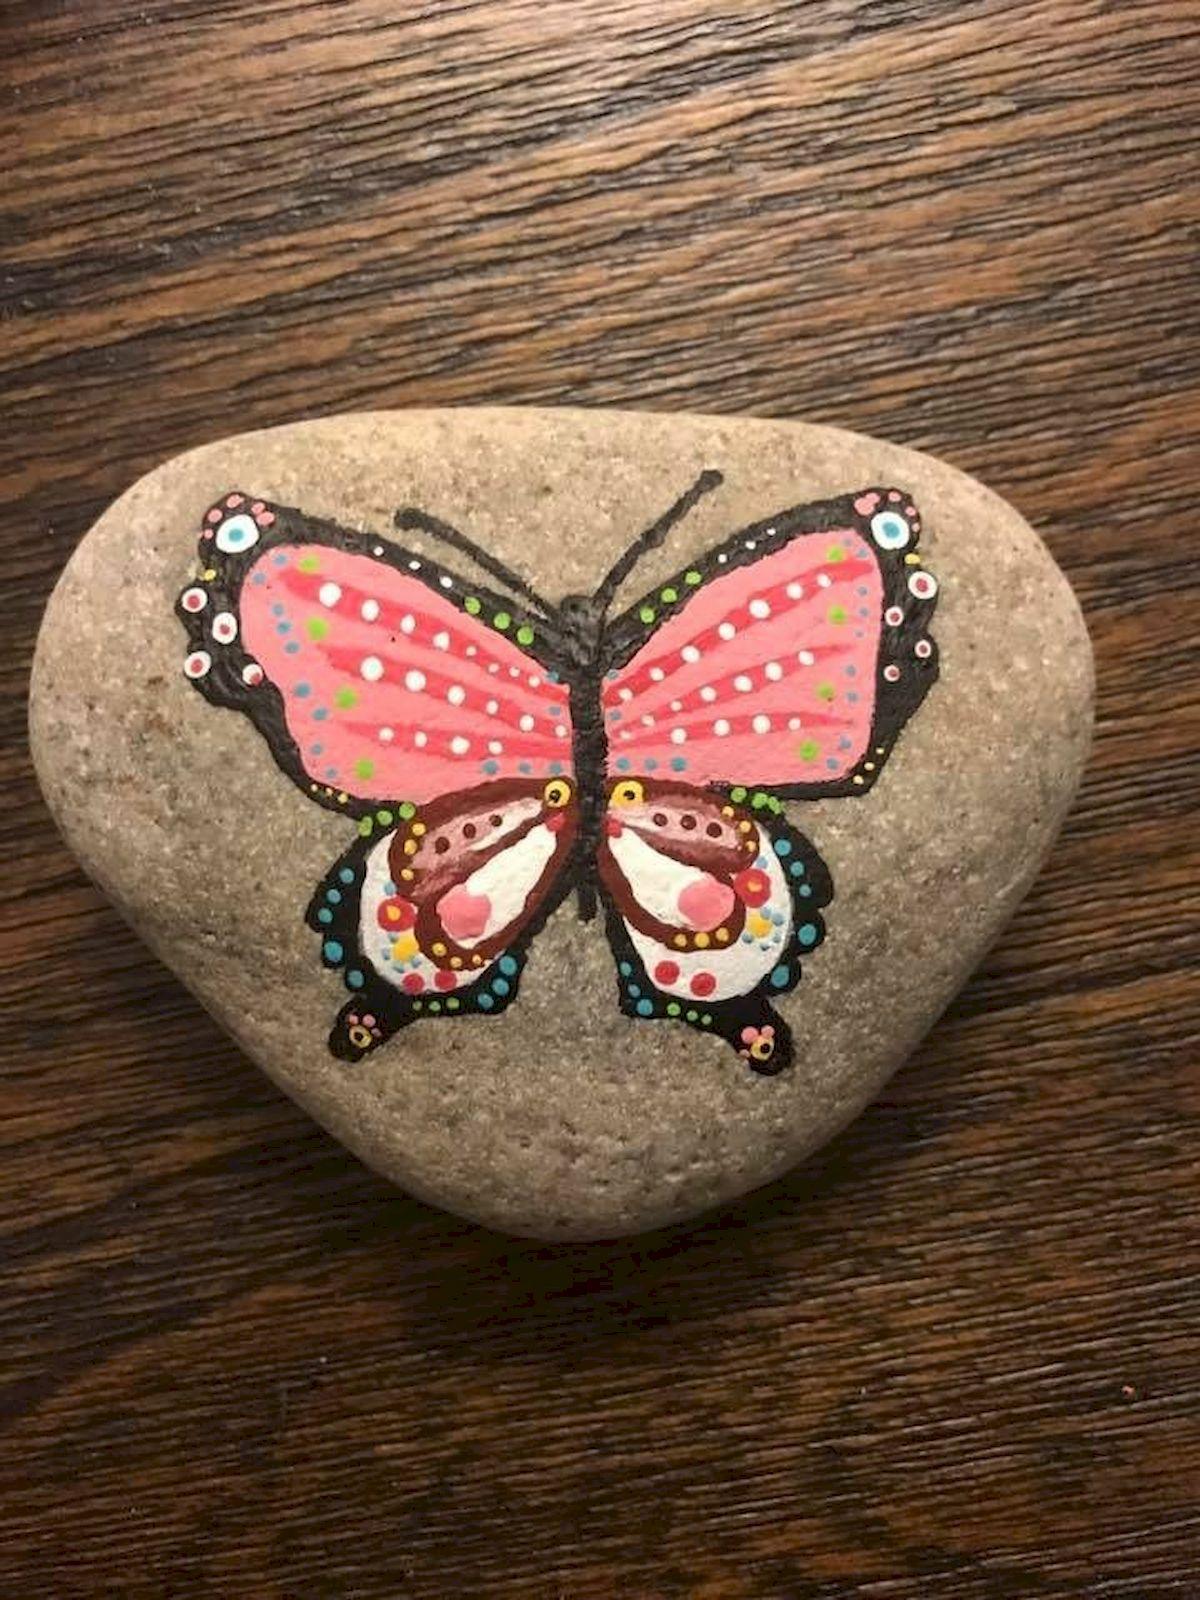 55 Cute DIY Painted Rocks Animals Butterfly Ideas (9)